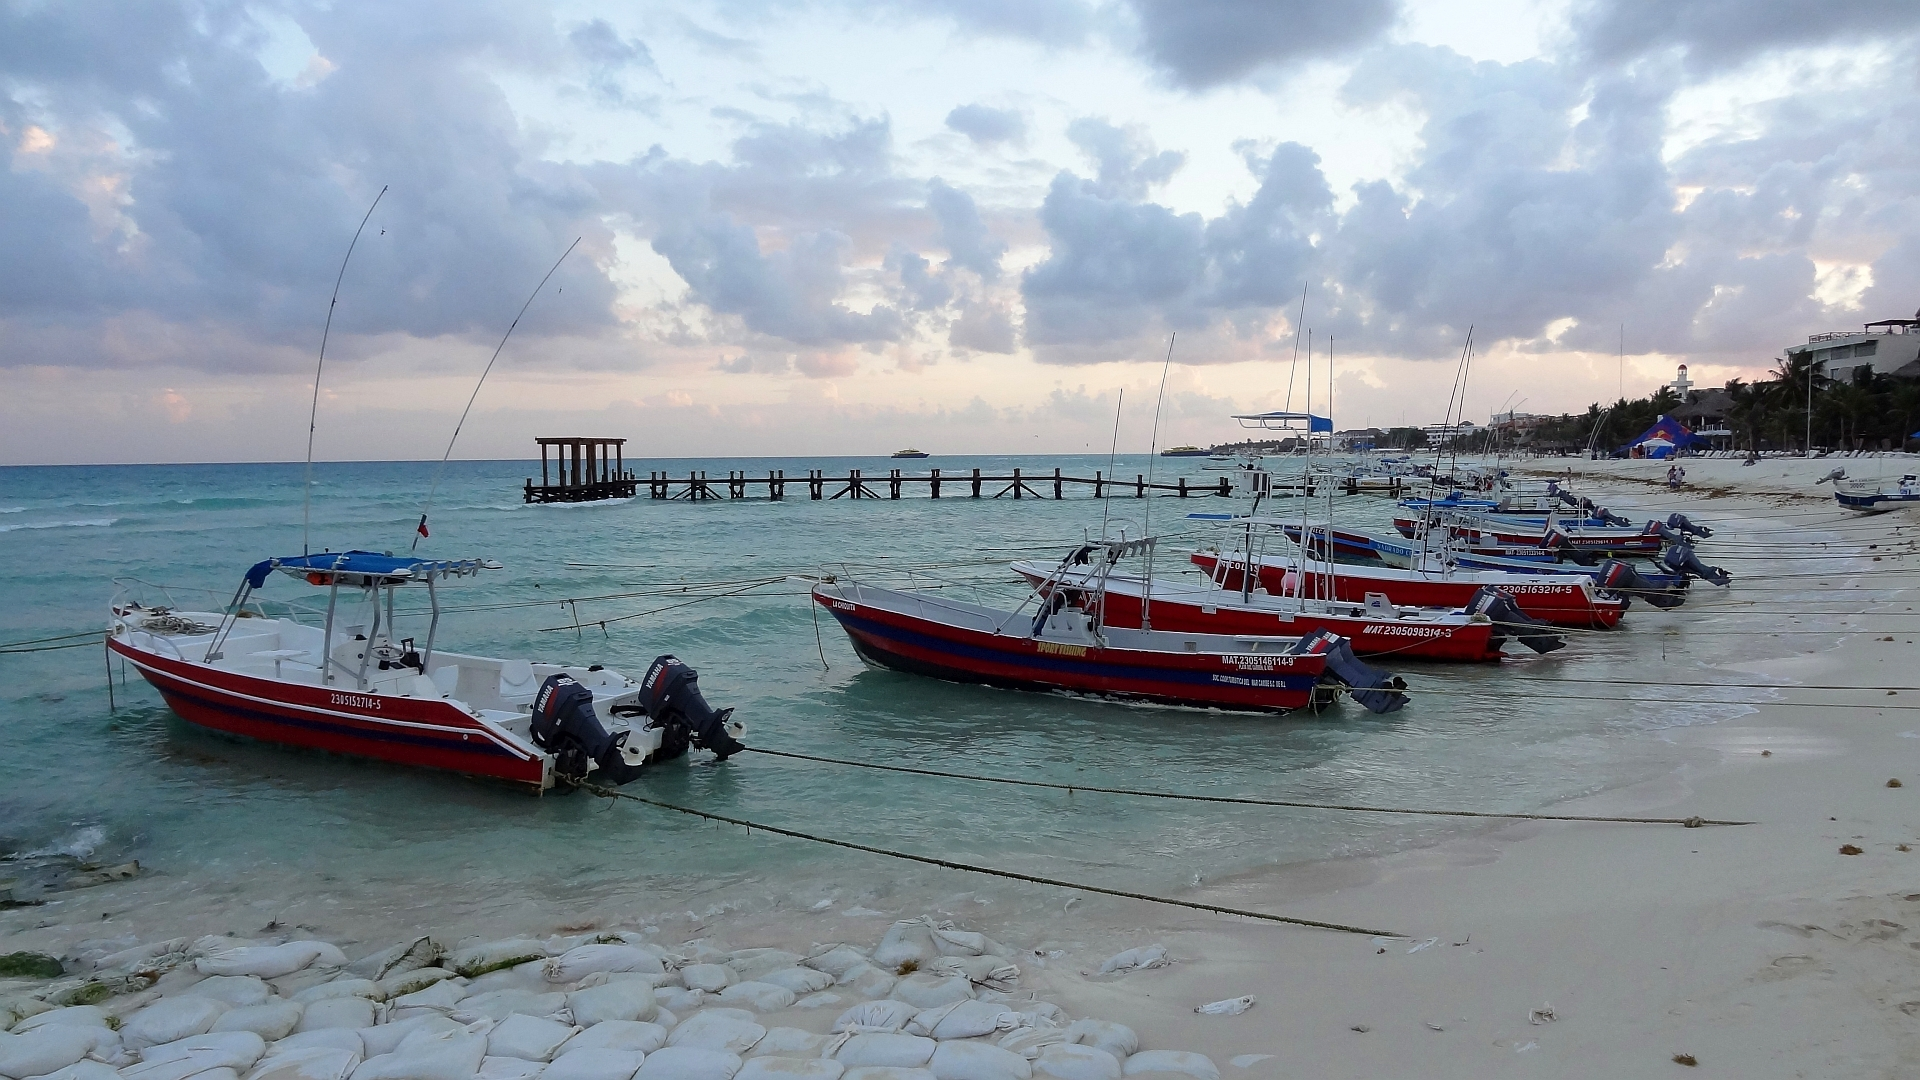 Meksyk plan podróży, Playa del Carmen, Meksyk